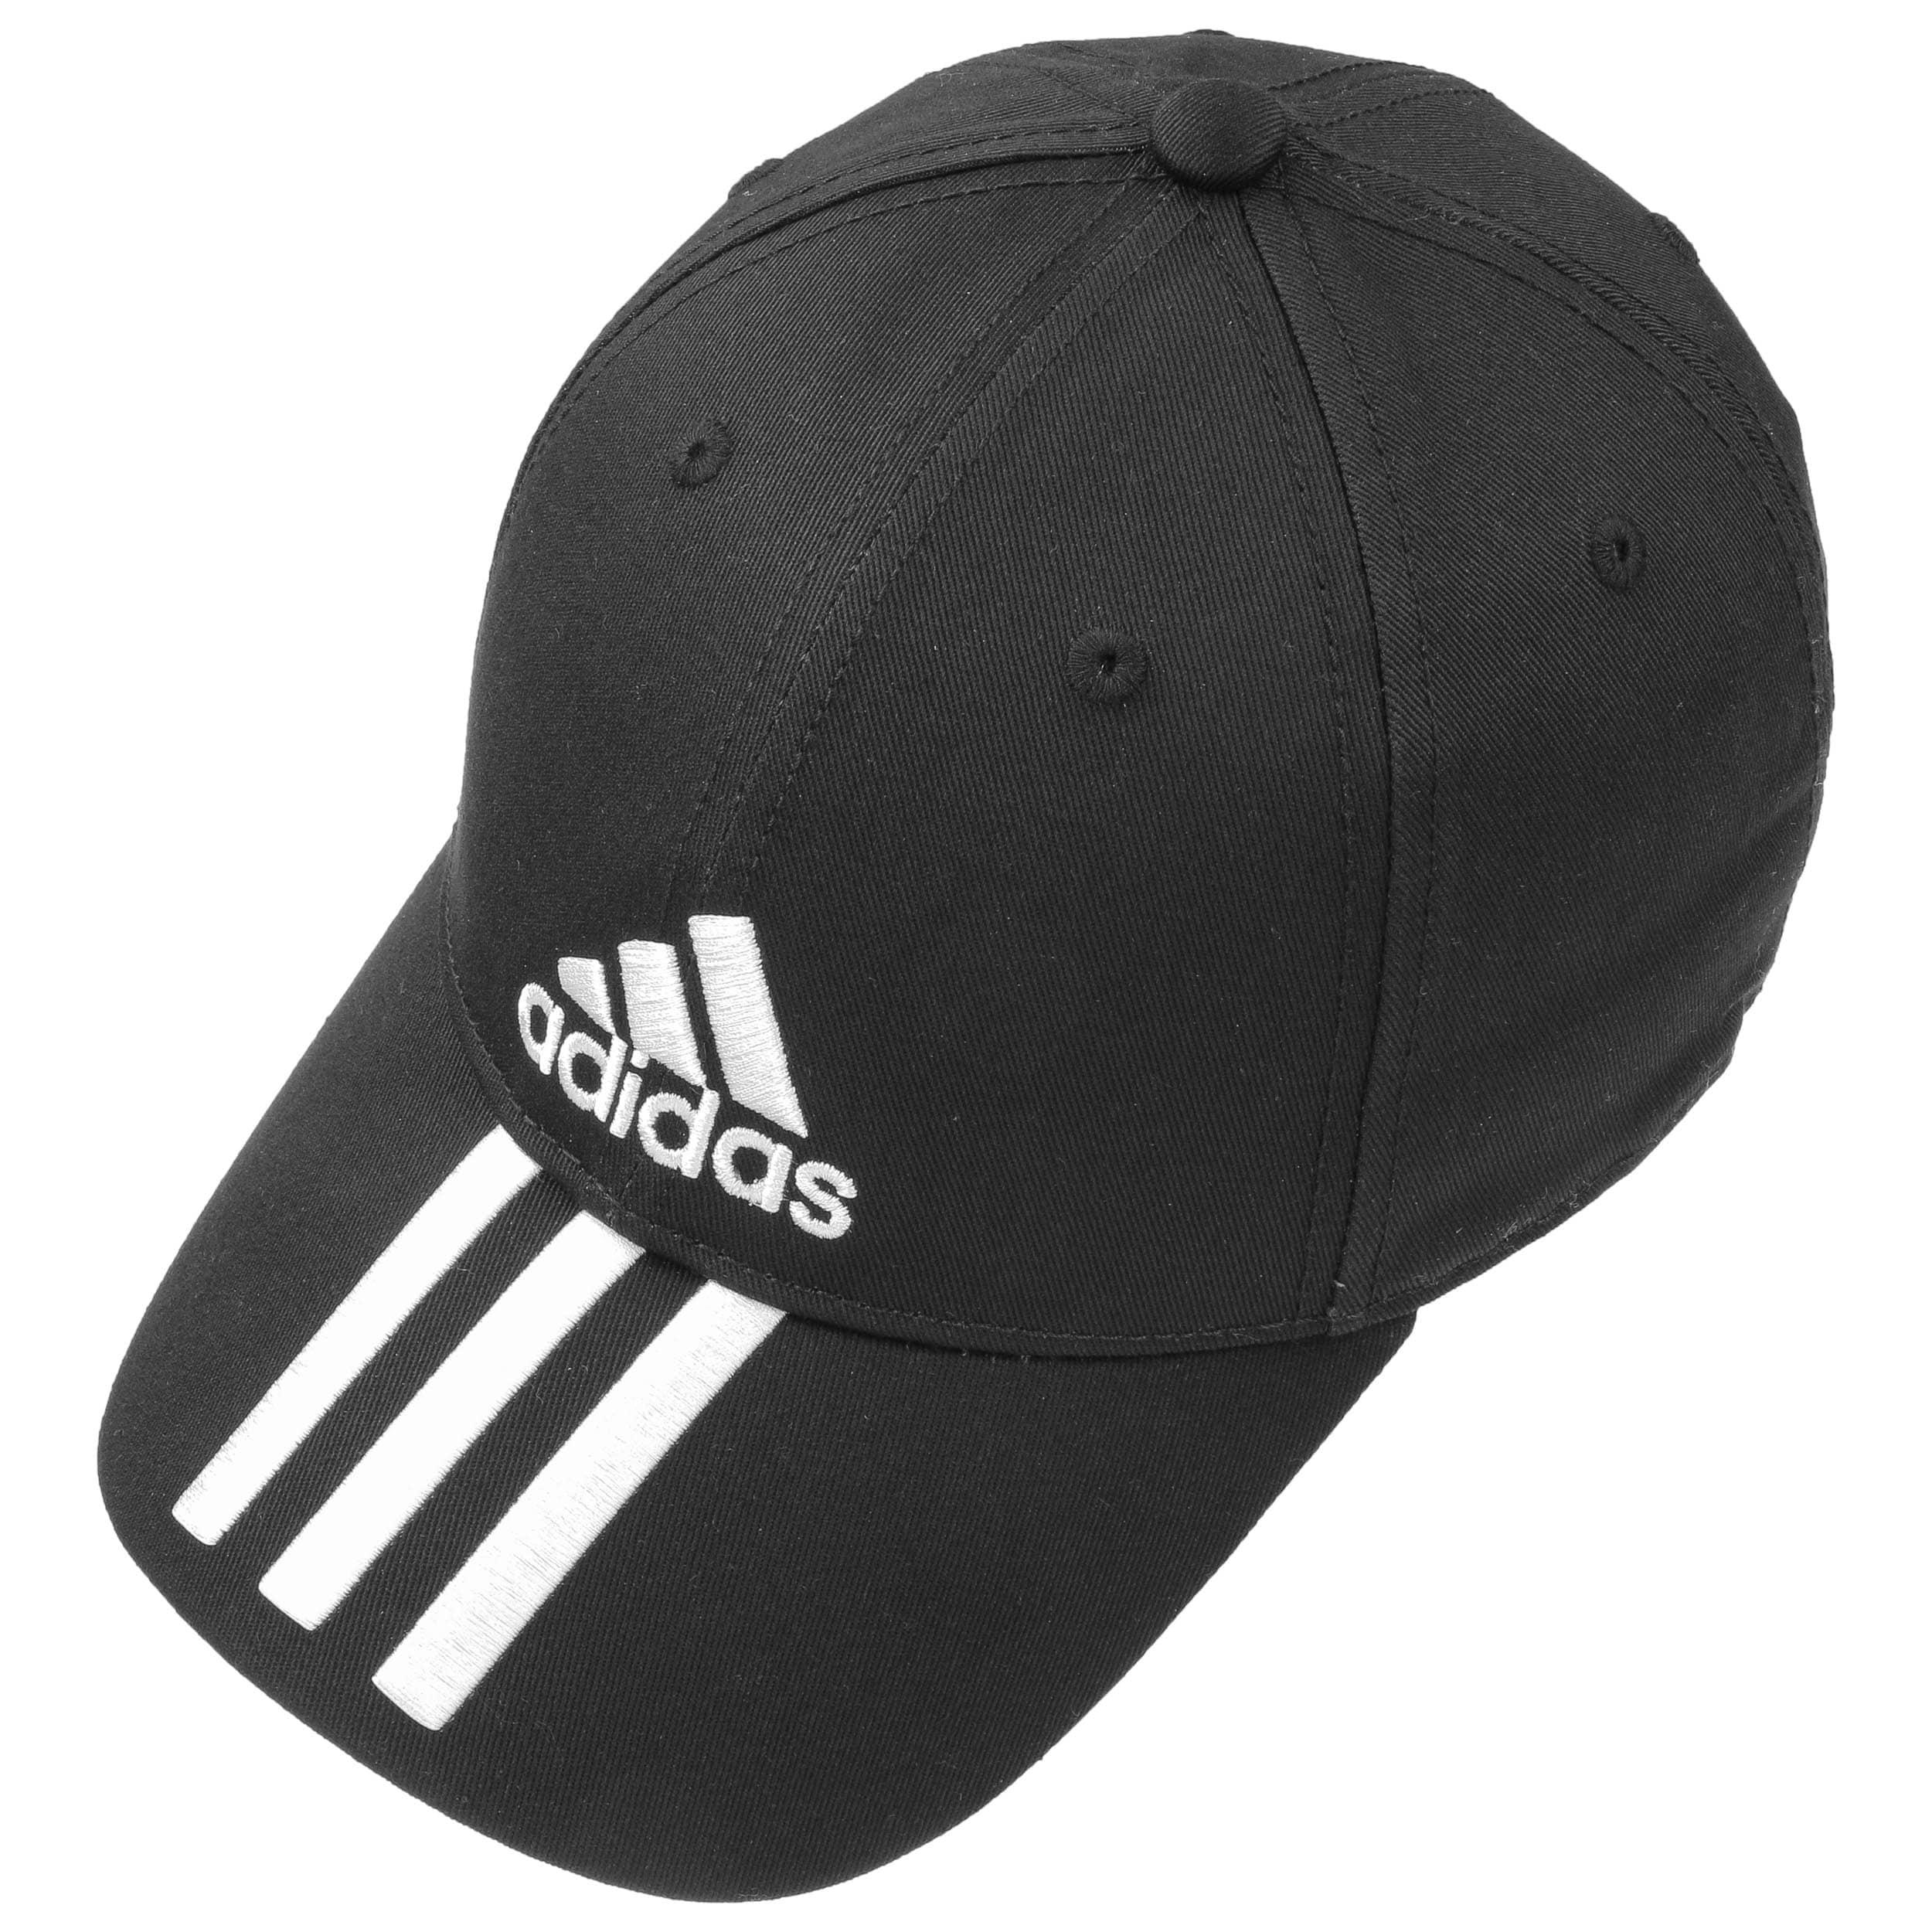 b176cecff4665 Gorra 6P 3S Cotton Strapback by adidas - Gorras - sombreroshop.es